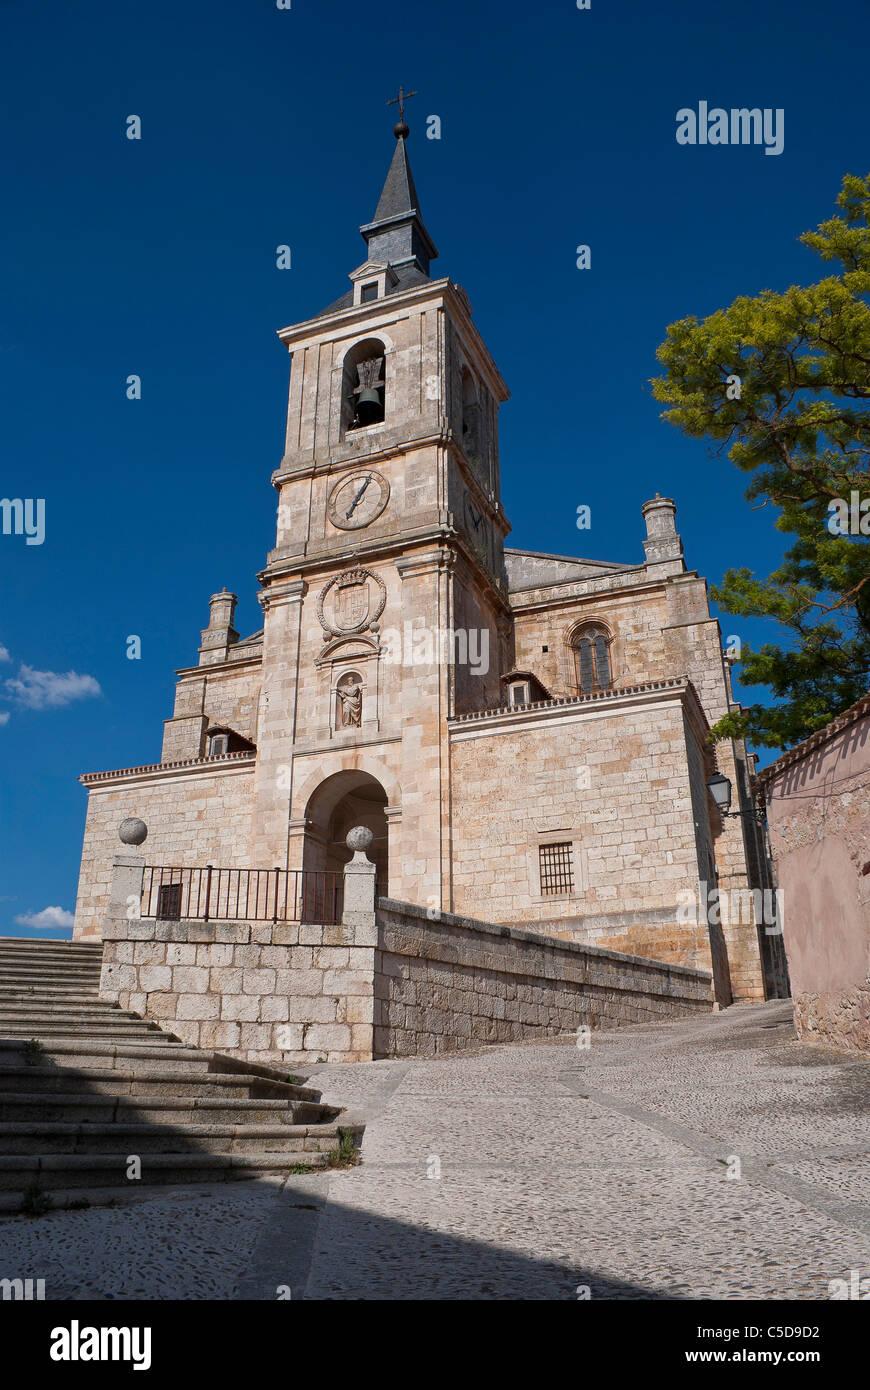 Lerma old city in Burgos, Collegiate church of San Pedro in Lerma Stock Photo